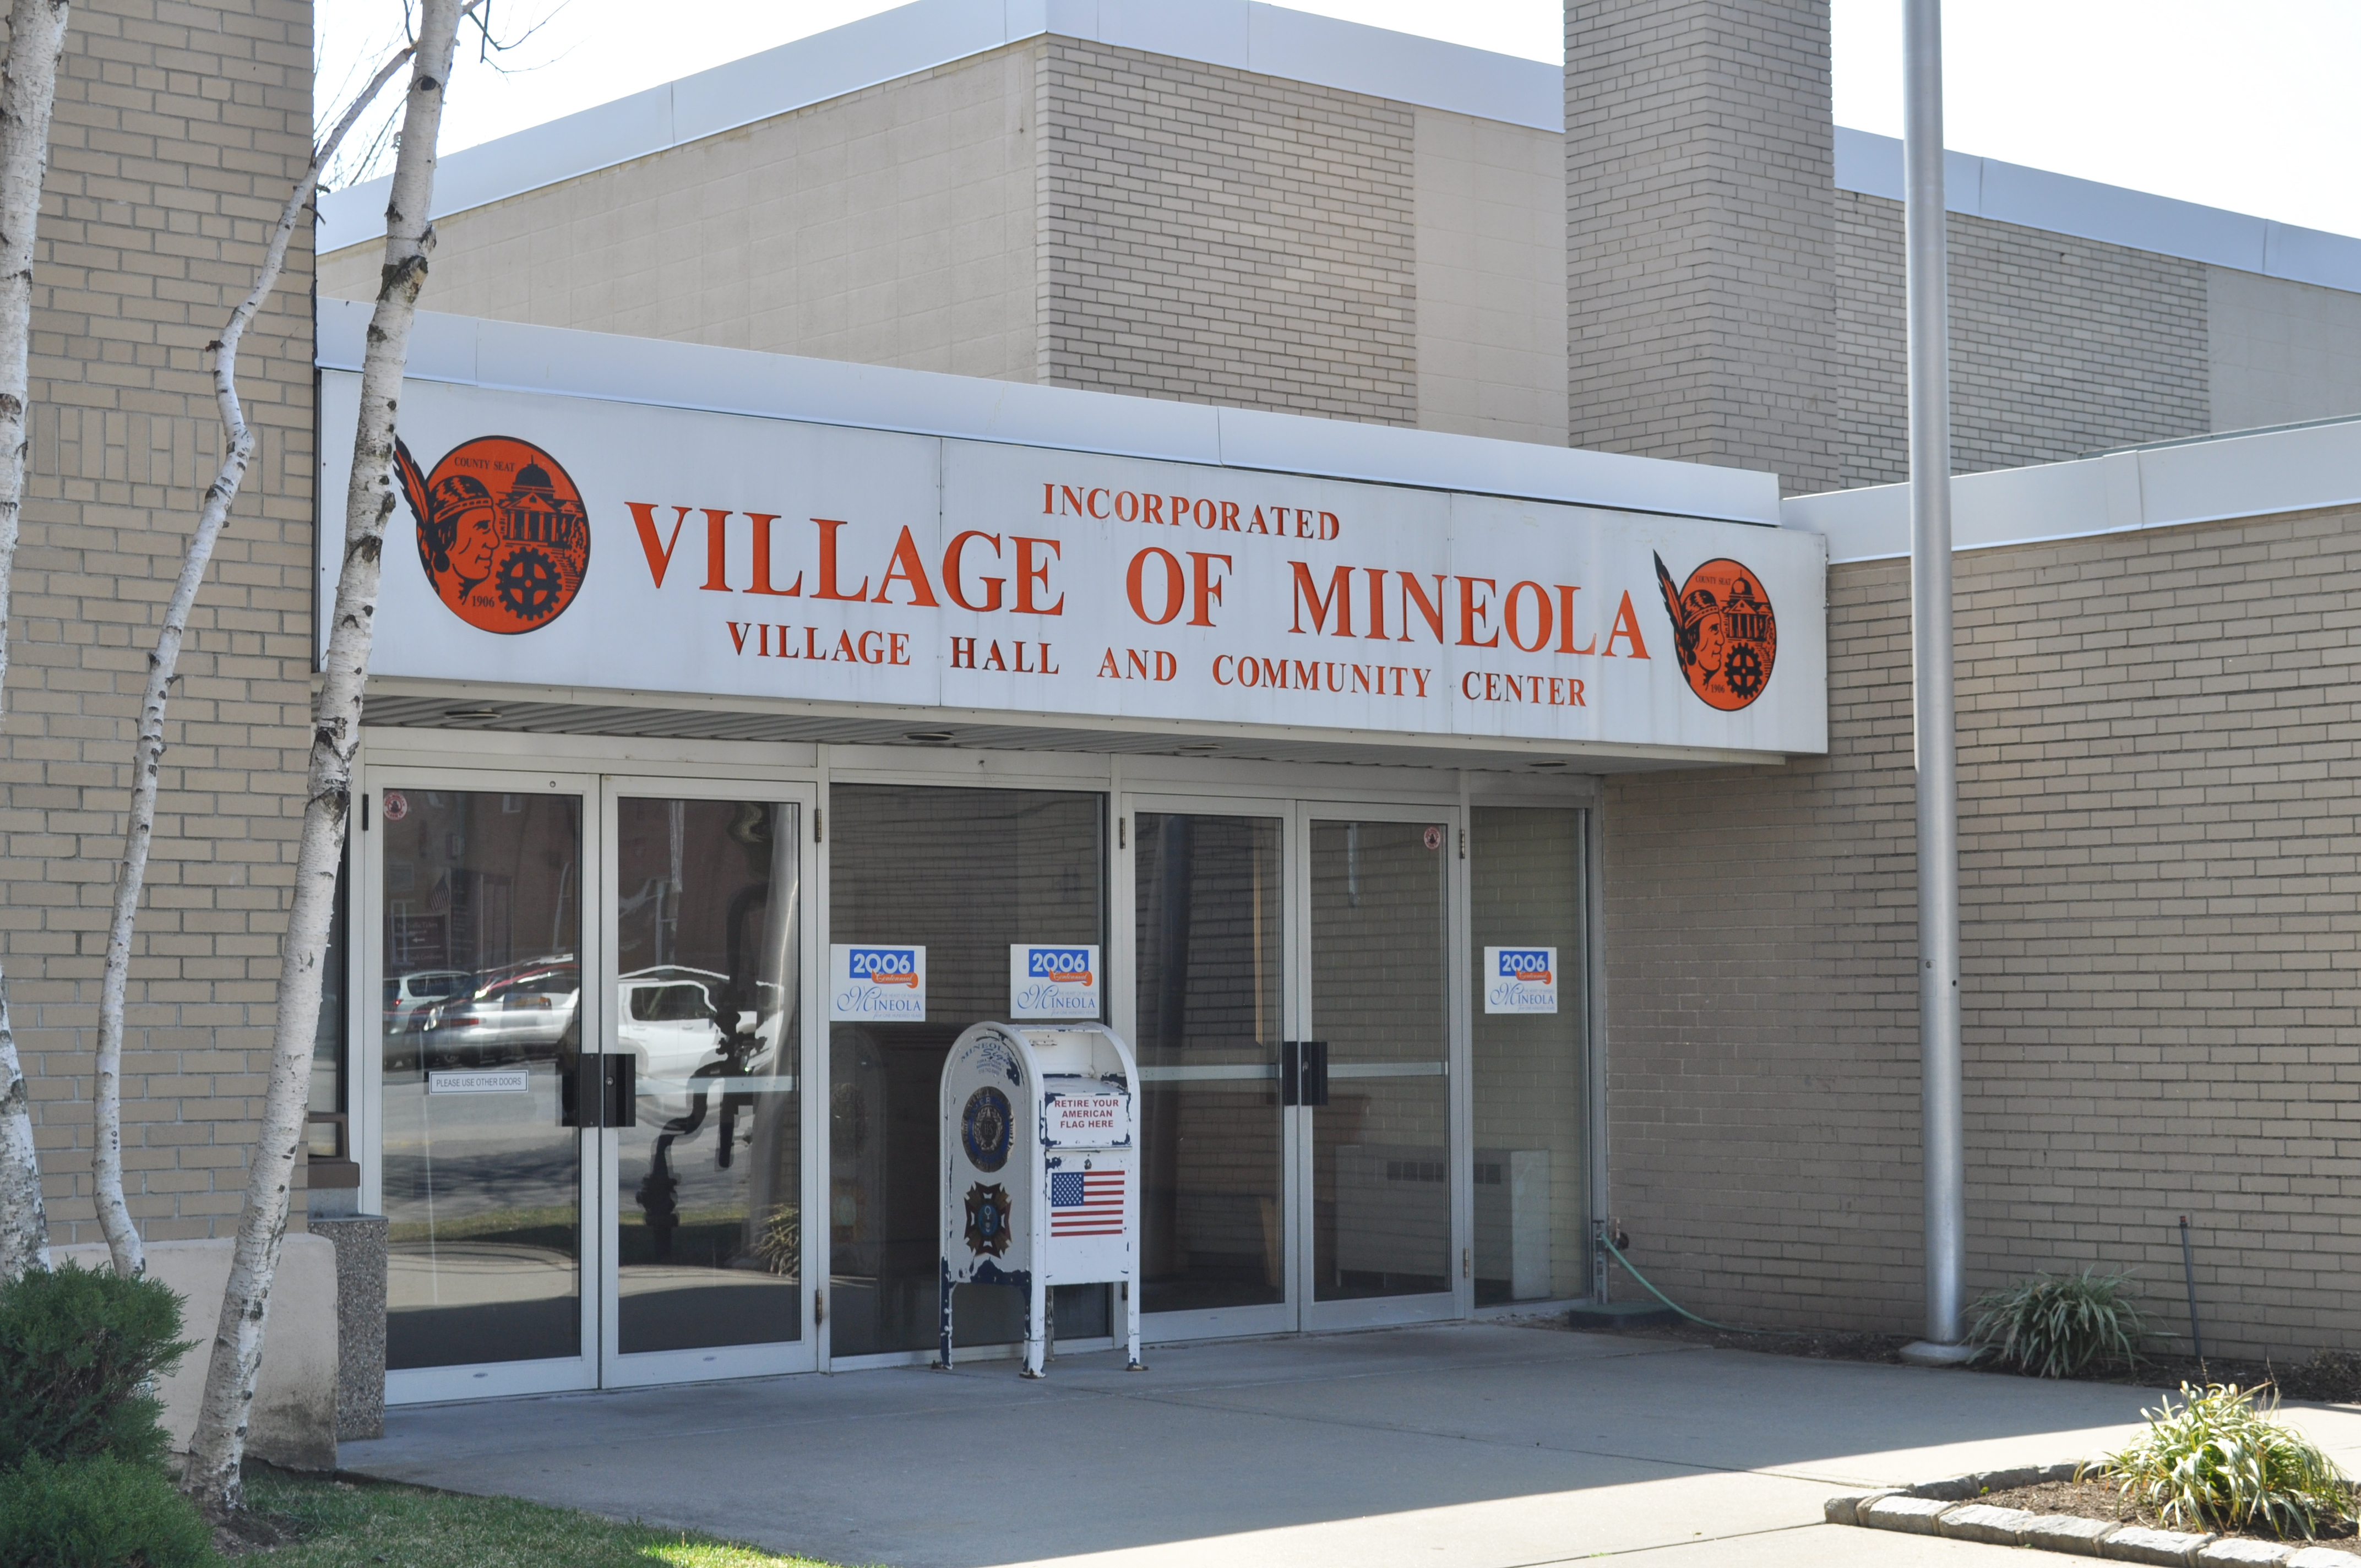 File:Mineola - Village Hall 01.jpg - Wikimedia Commonsmineola village